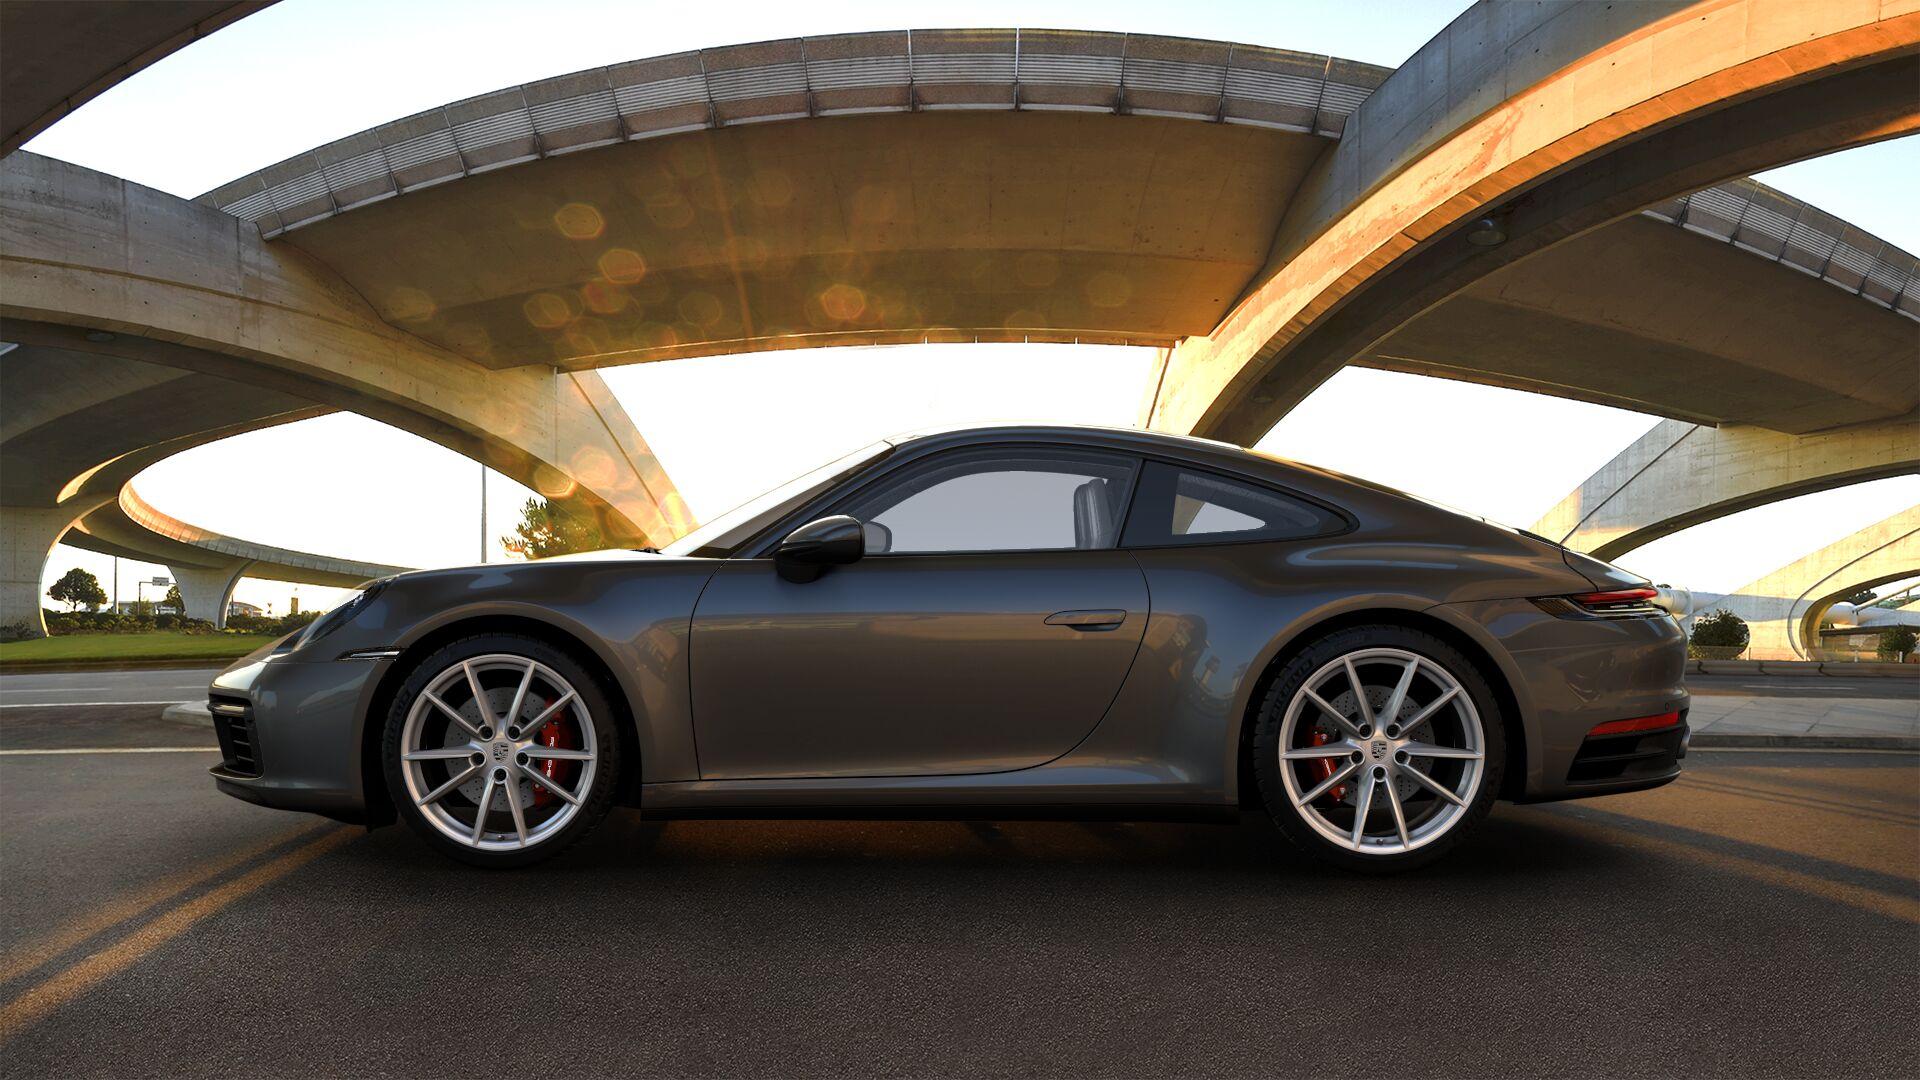 Agate Grey 2020 Porsche 911 Looks Understated In Real